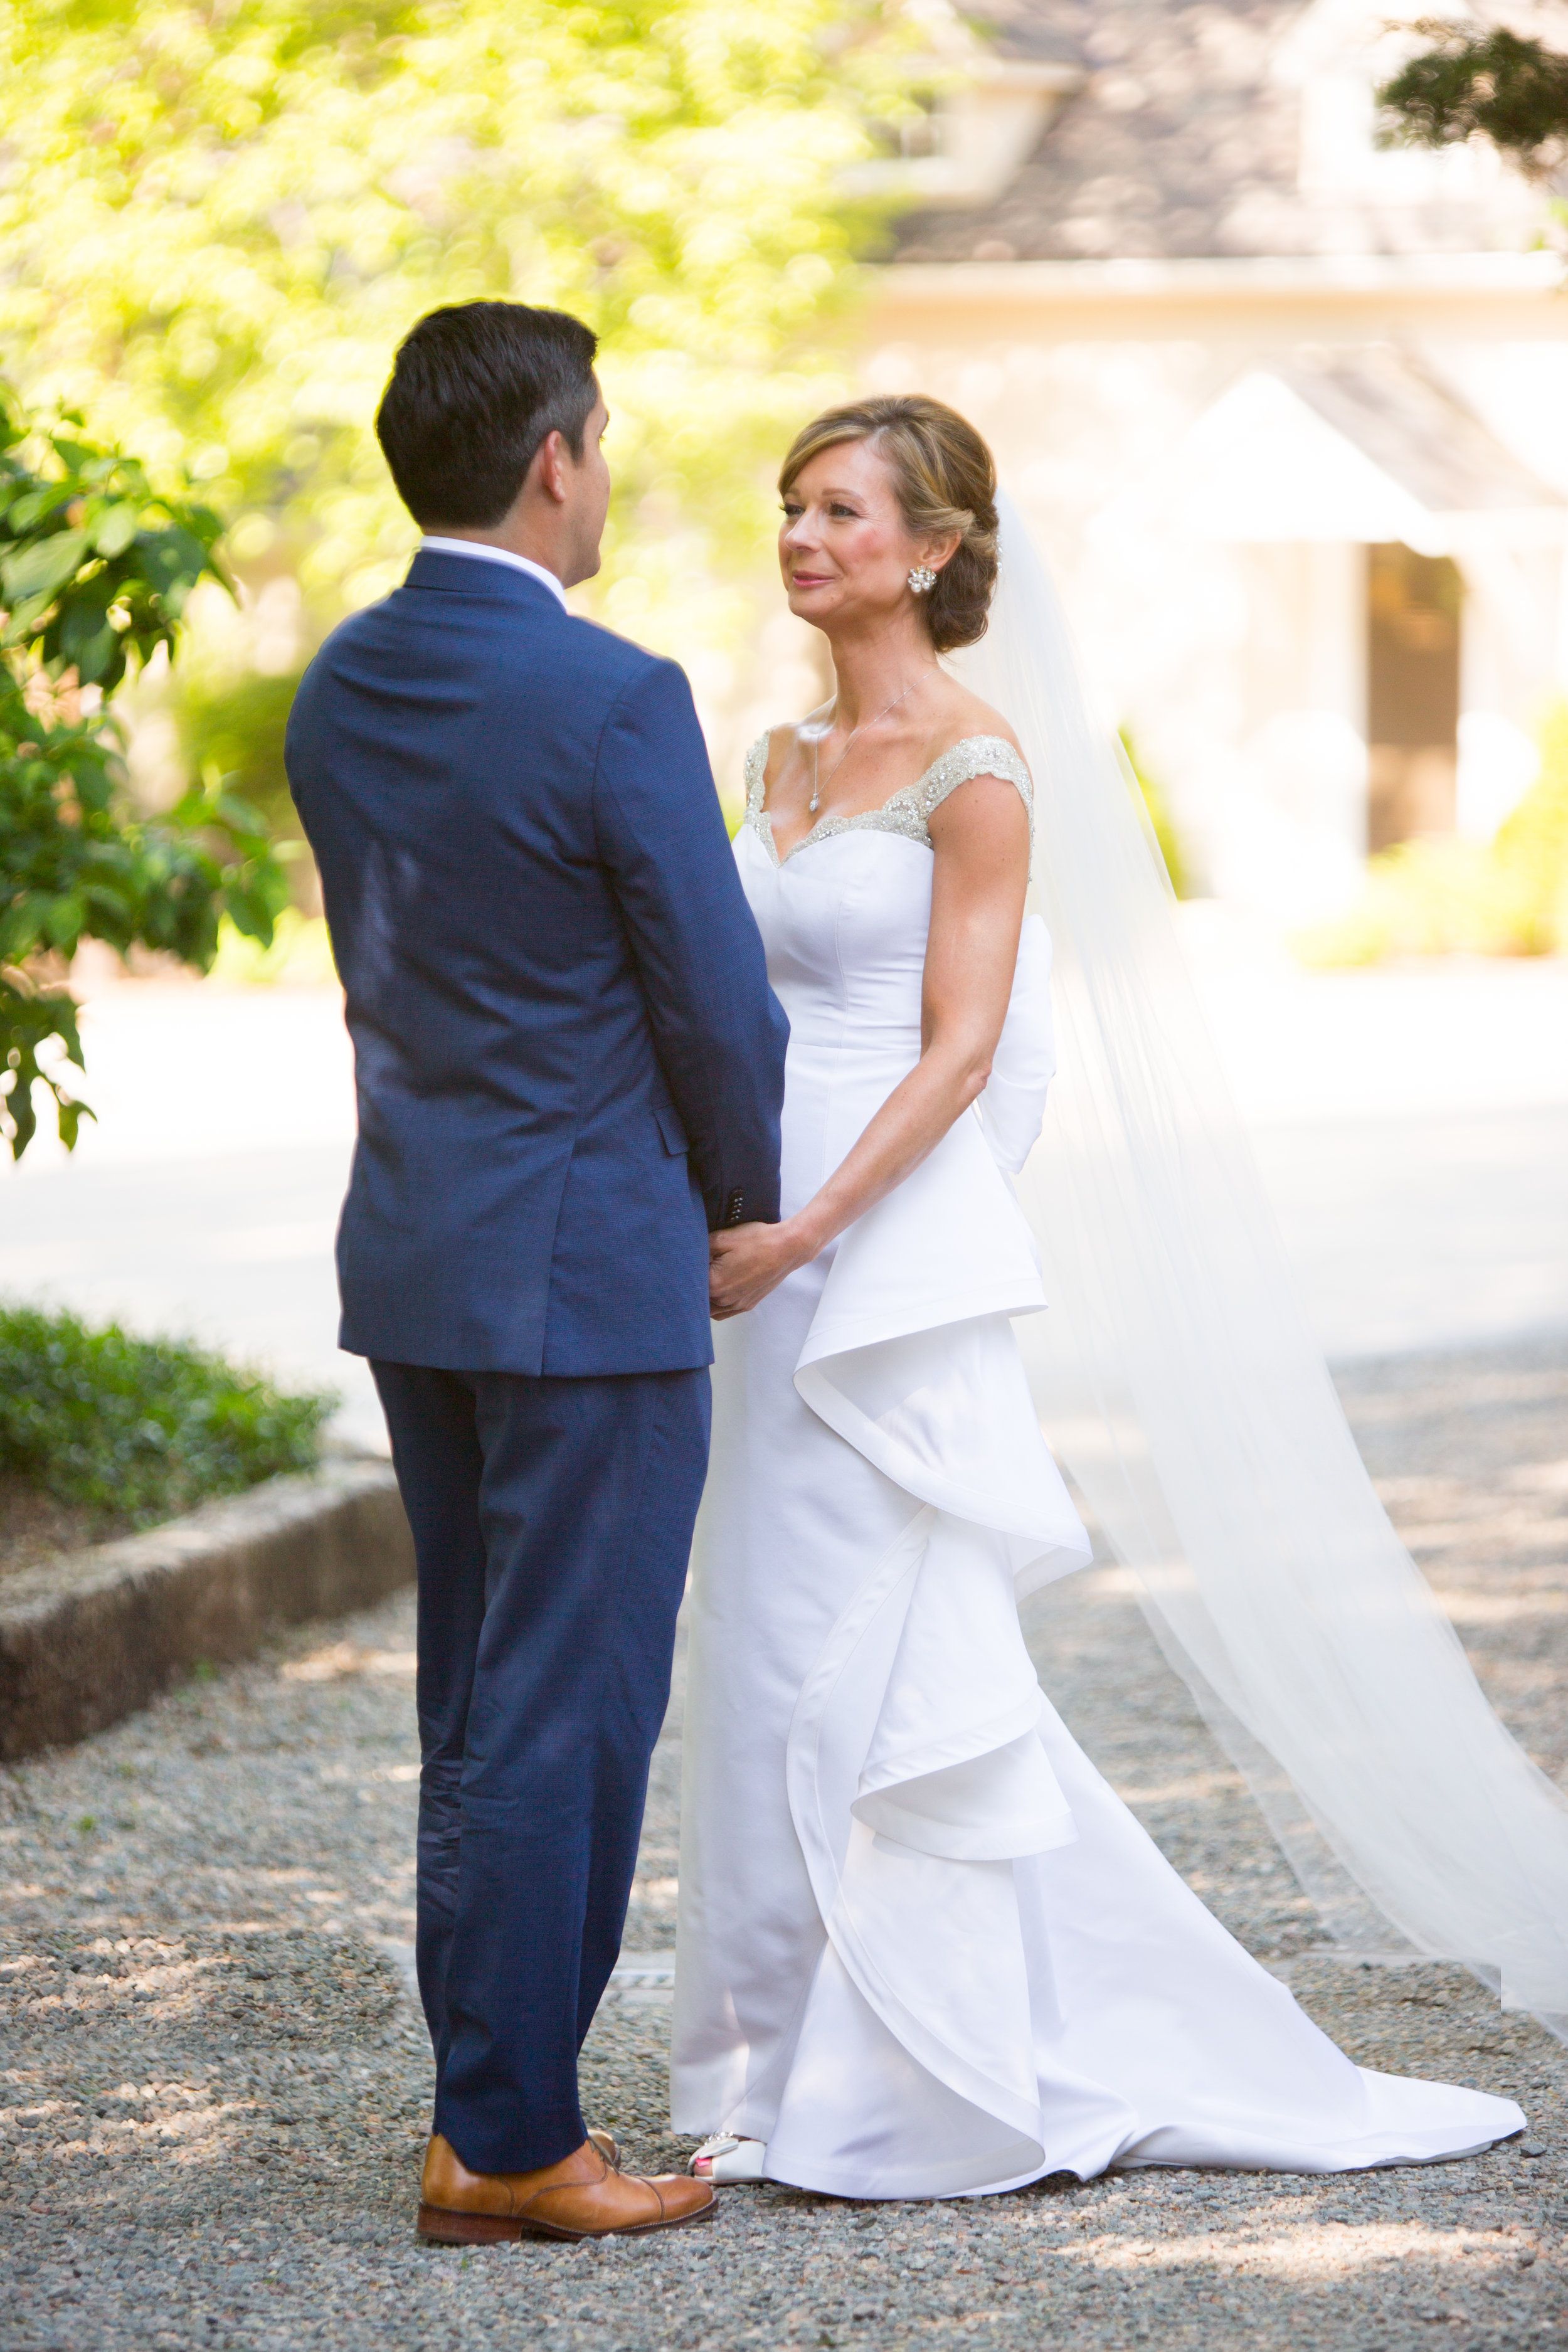 Lawter Wedding-51.jpg